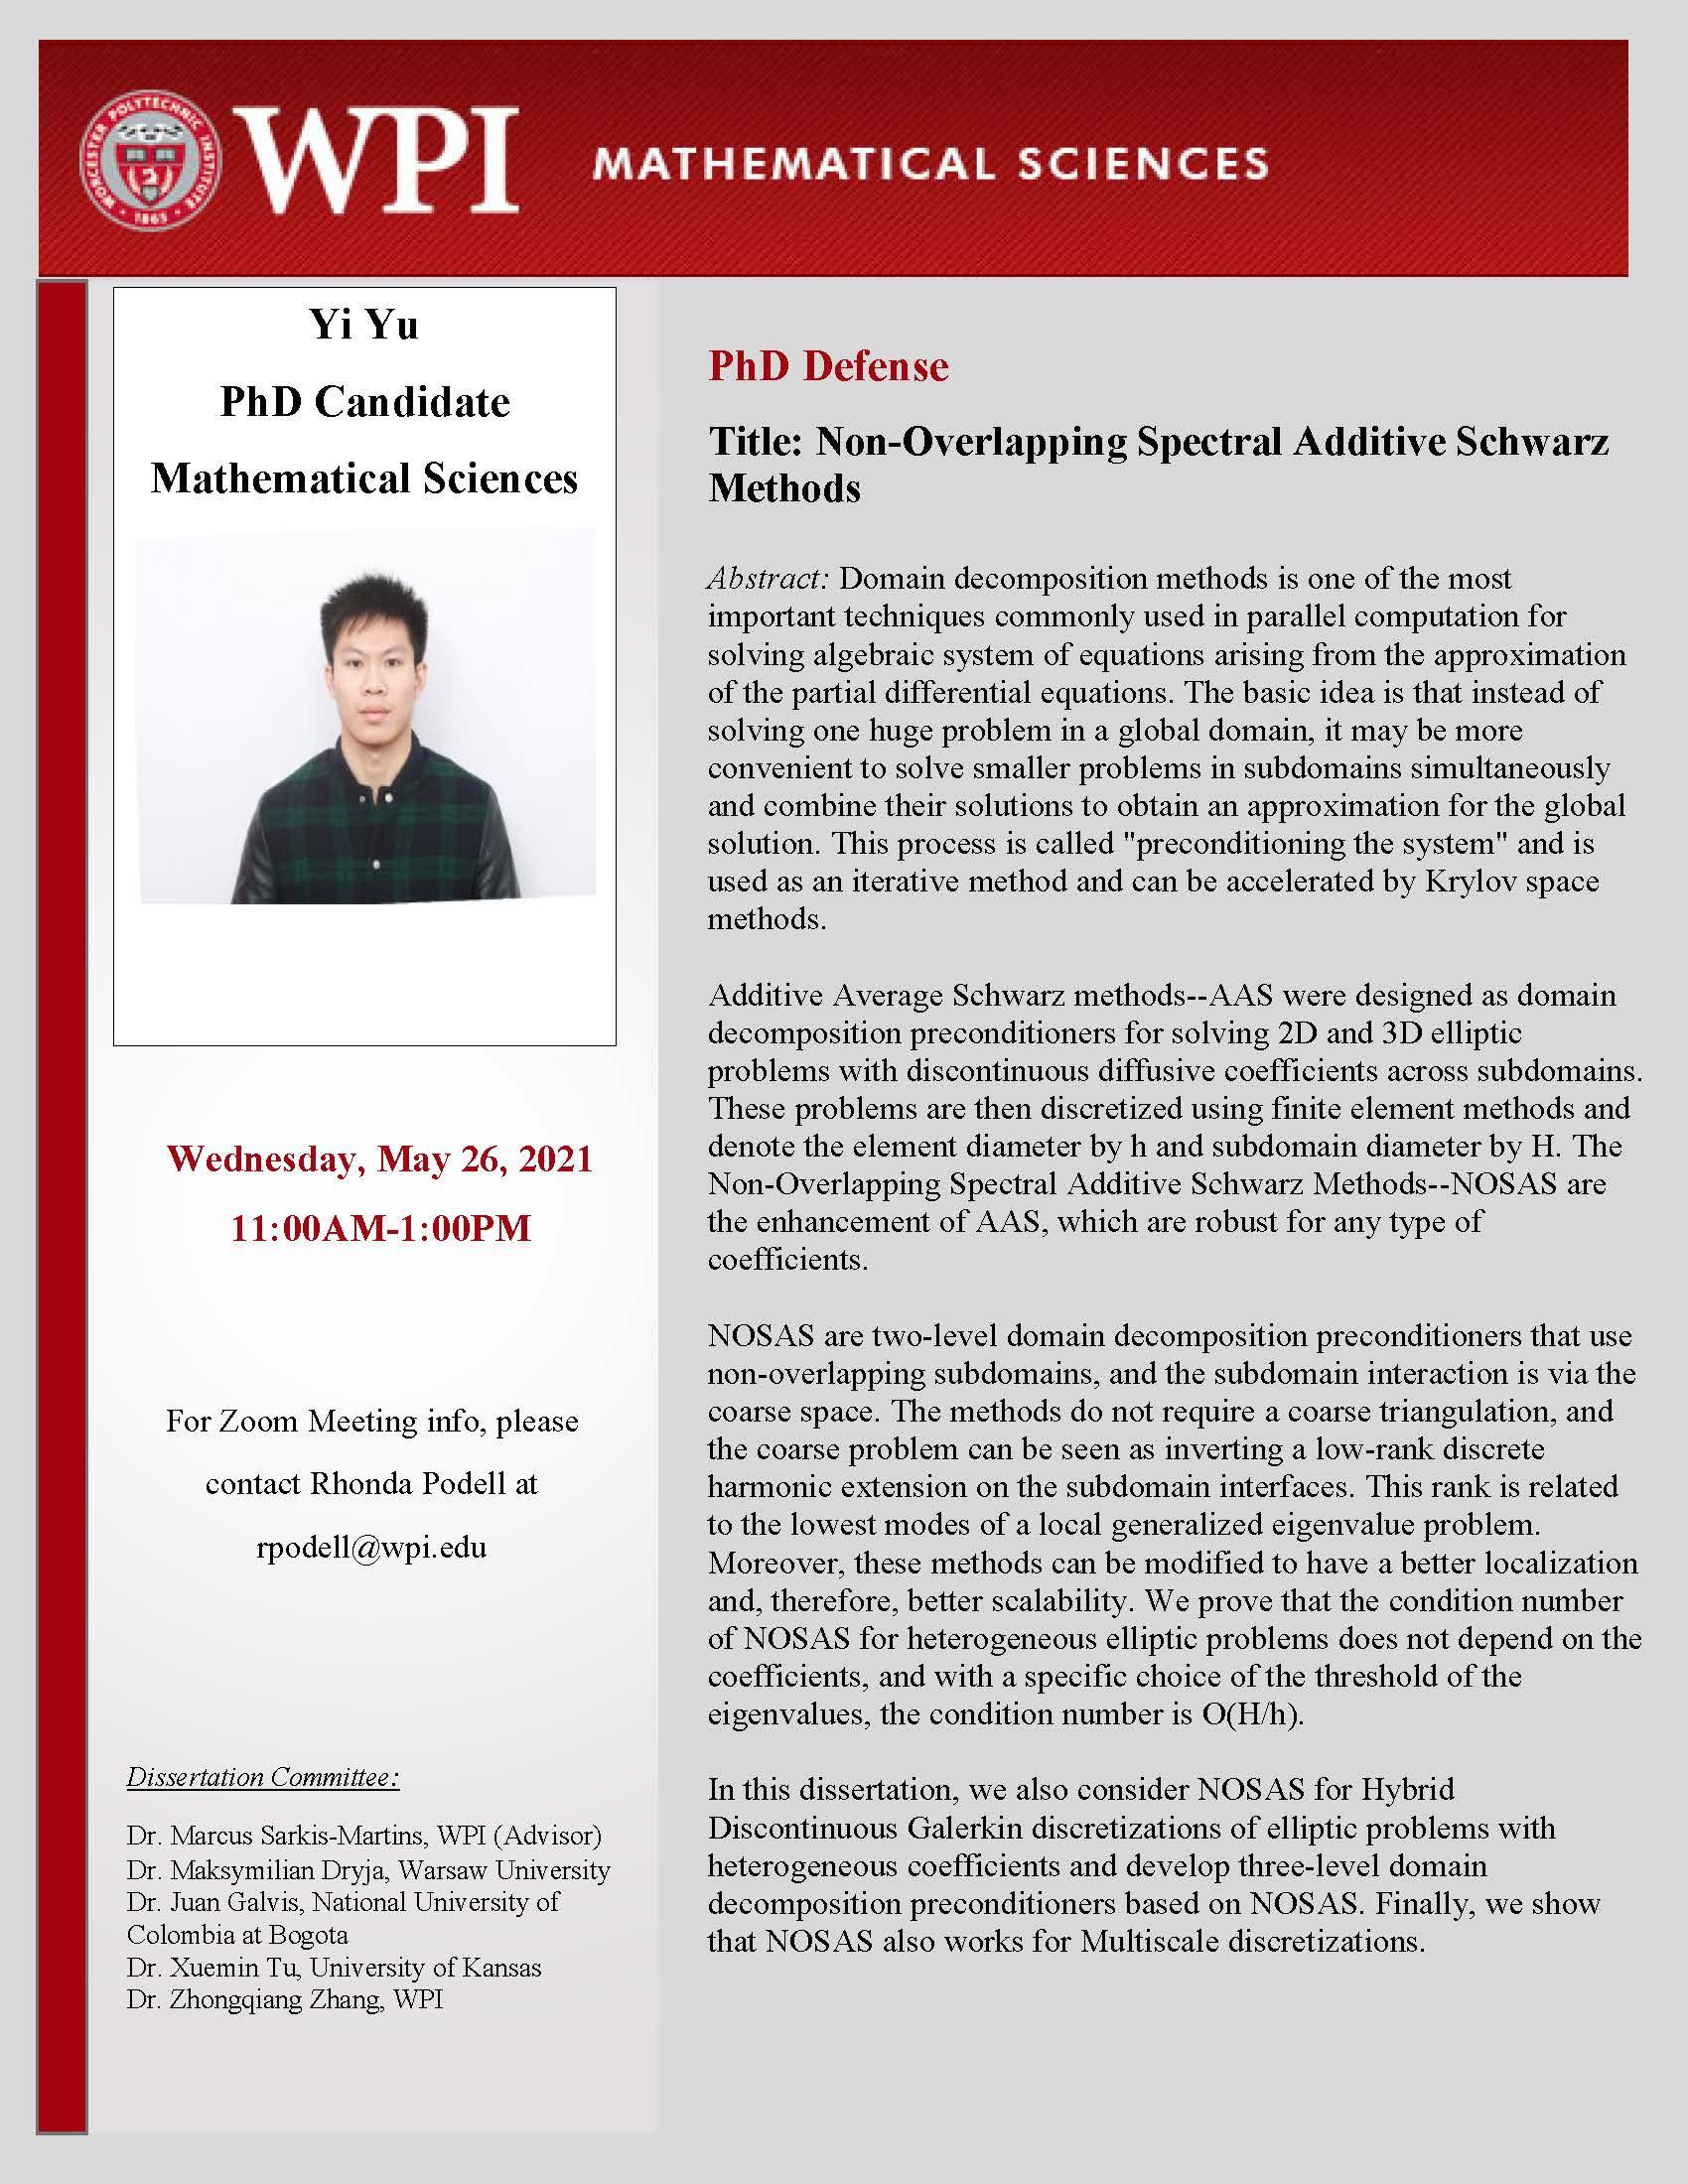 Yi Yu PhD Defense